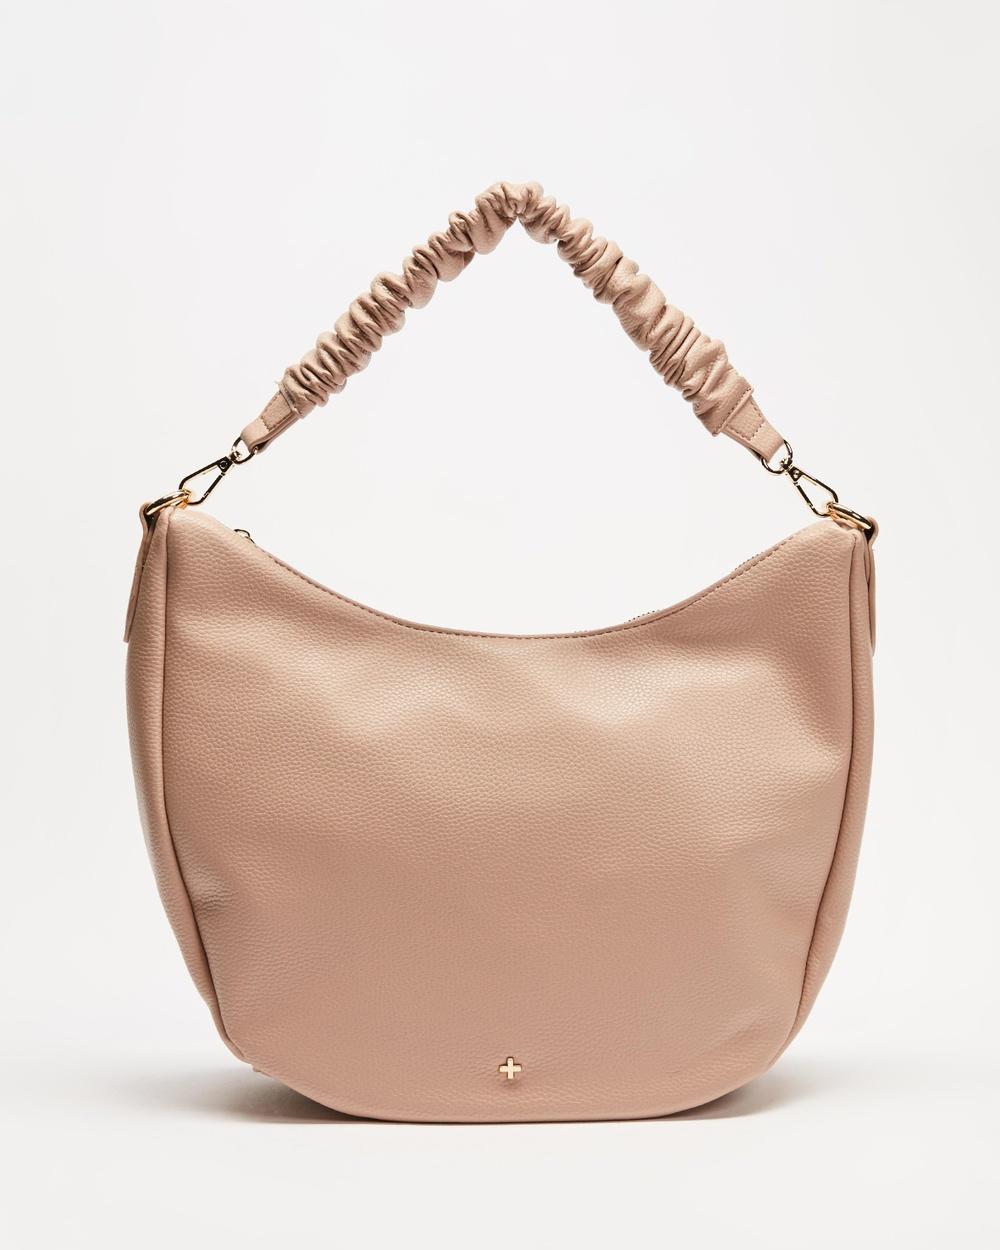 PETA AND JAIN Olive Handbags Nude